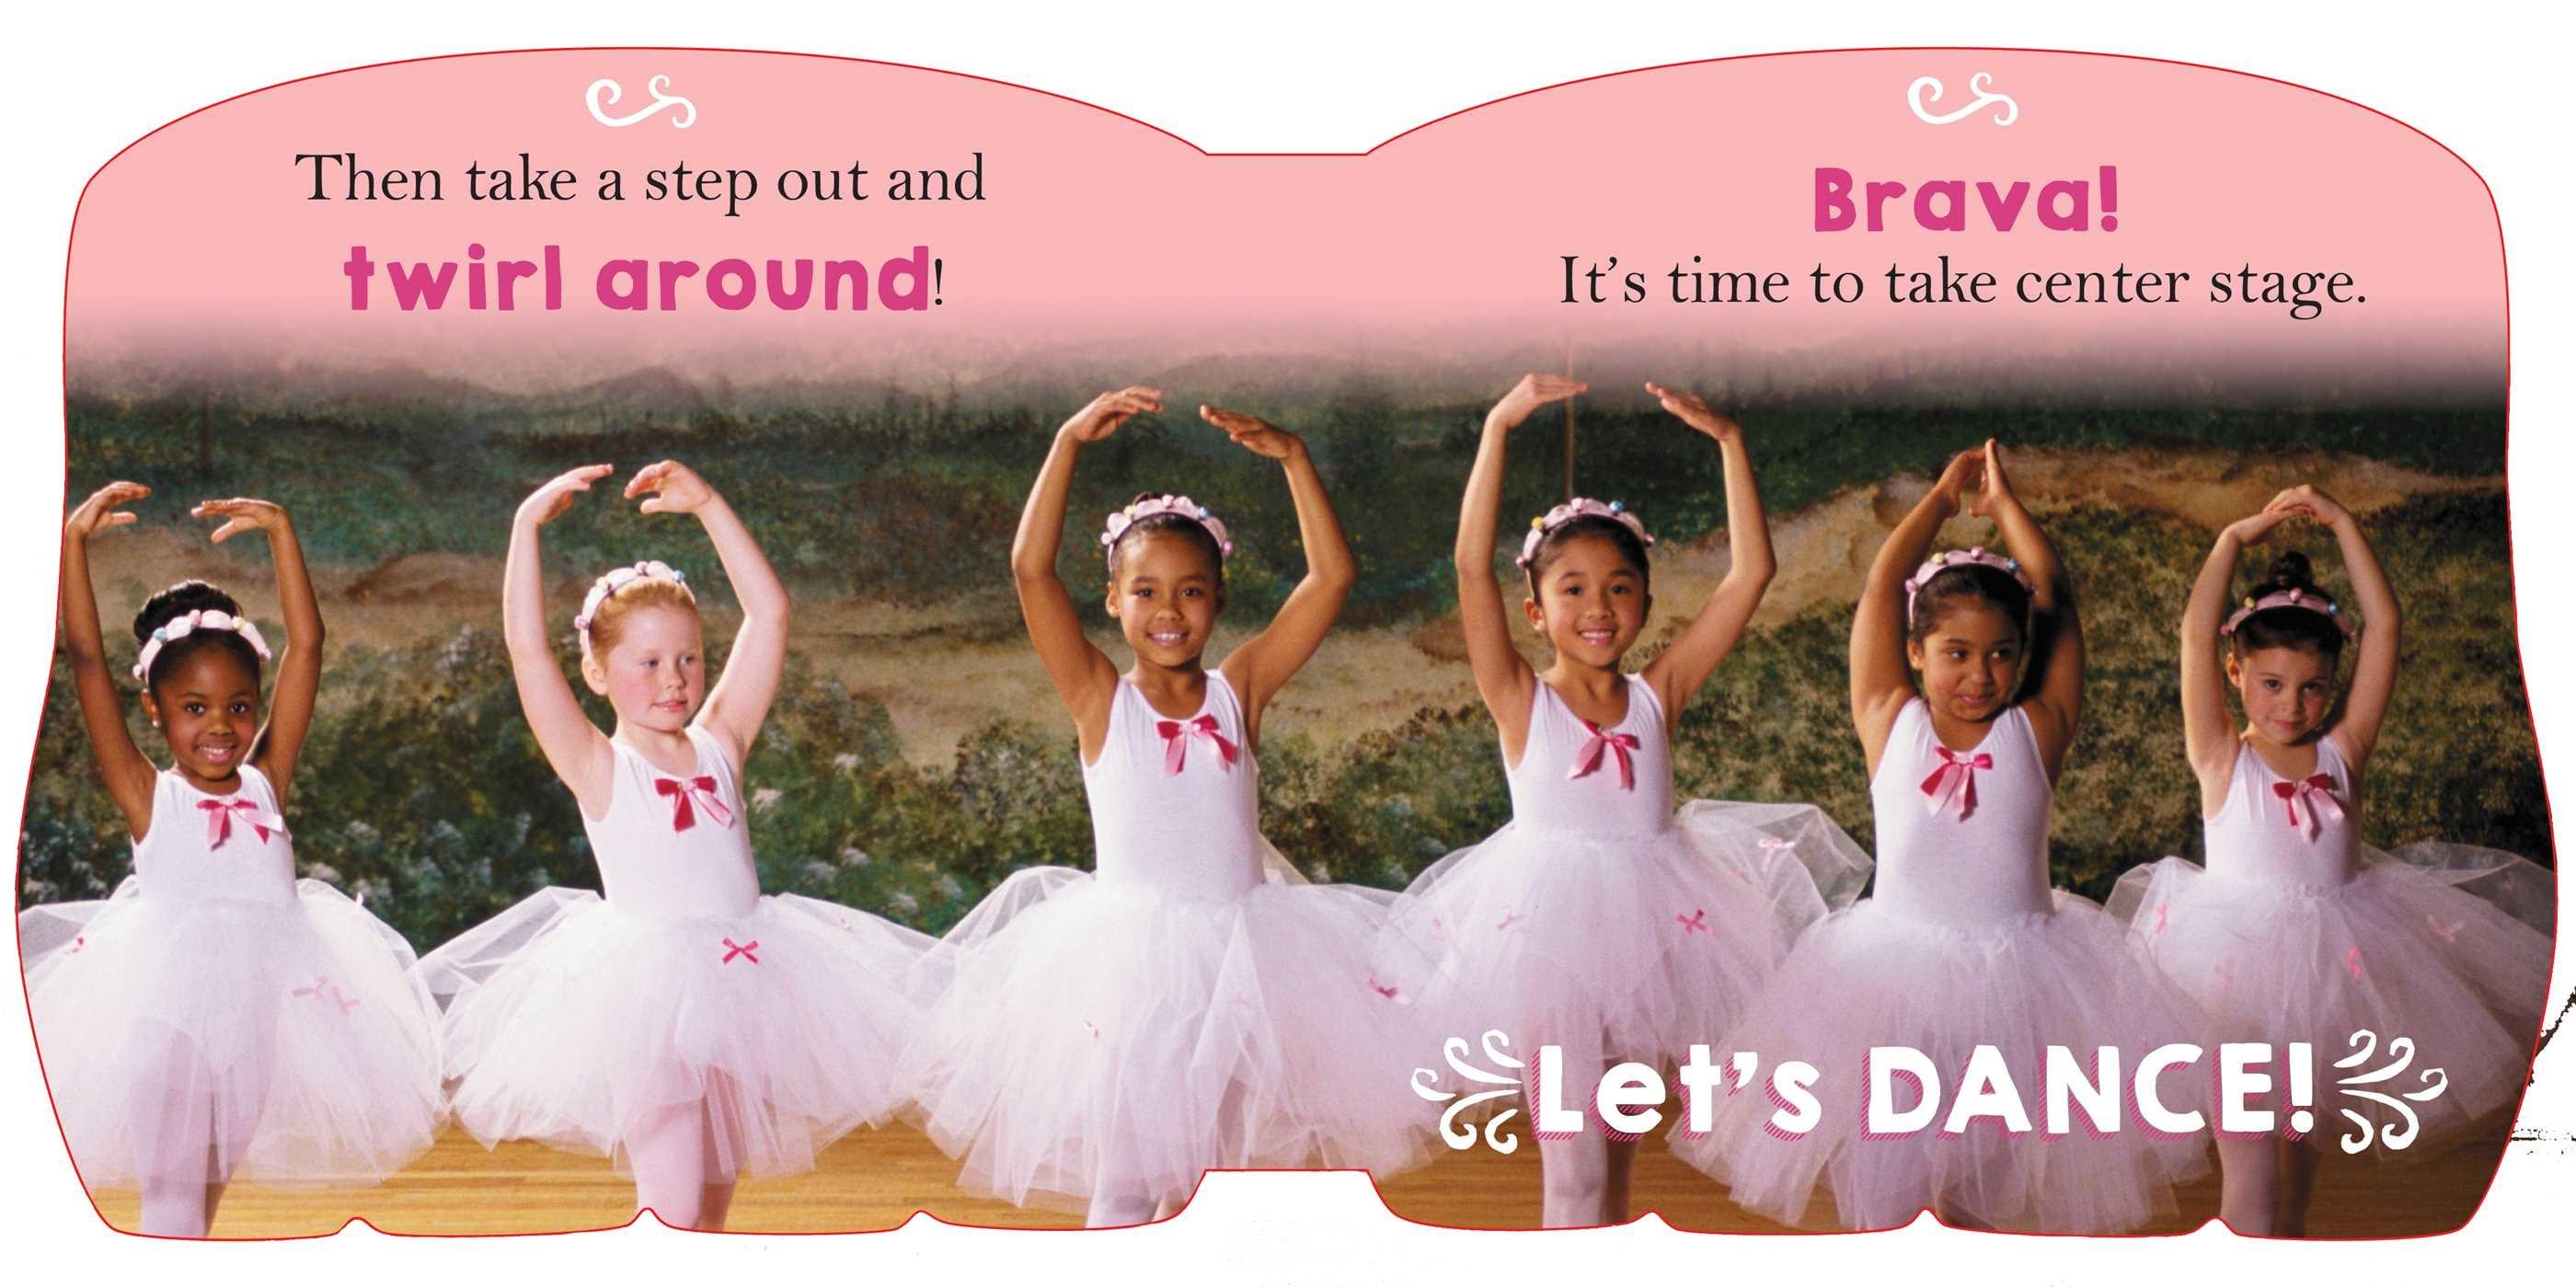 Ballet slippers 9781534422162.in05